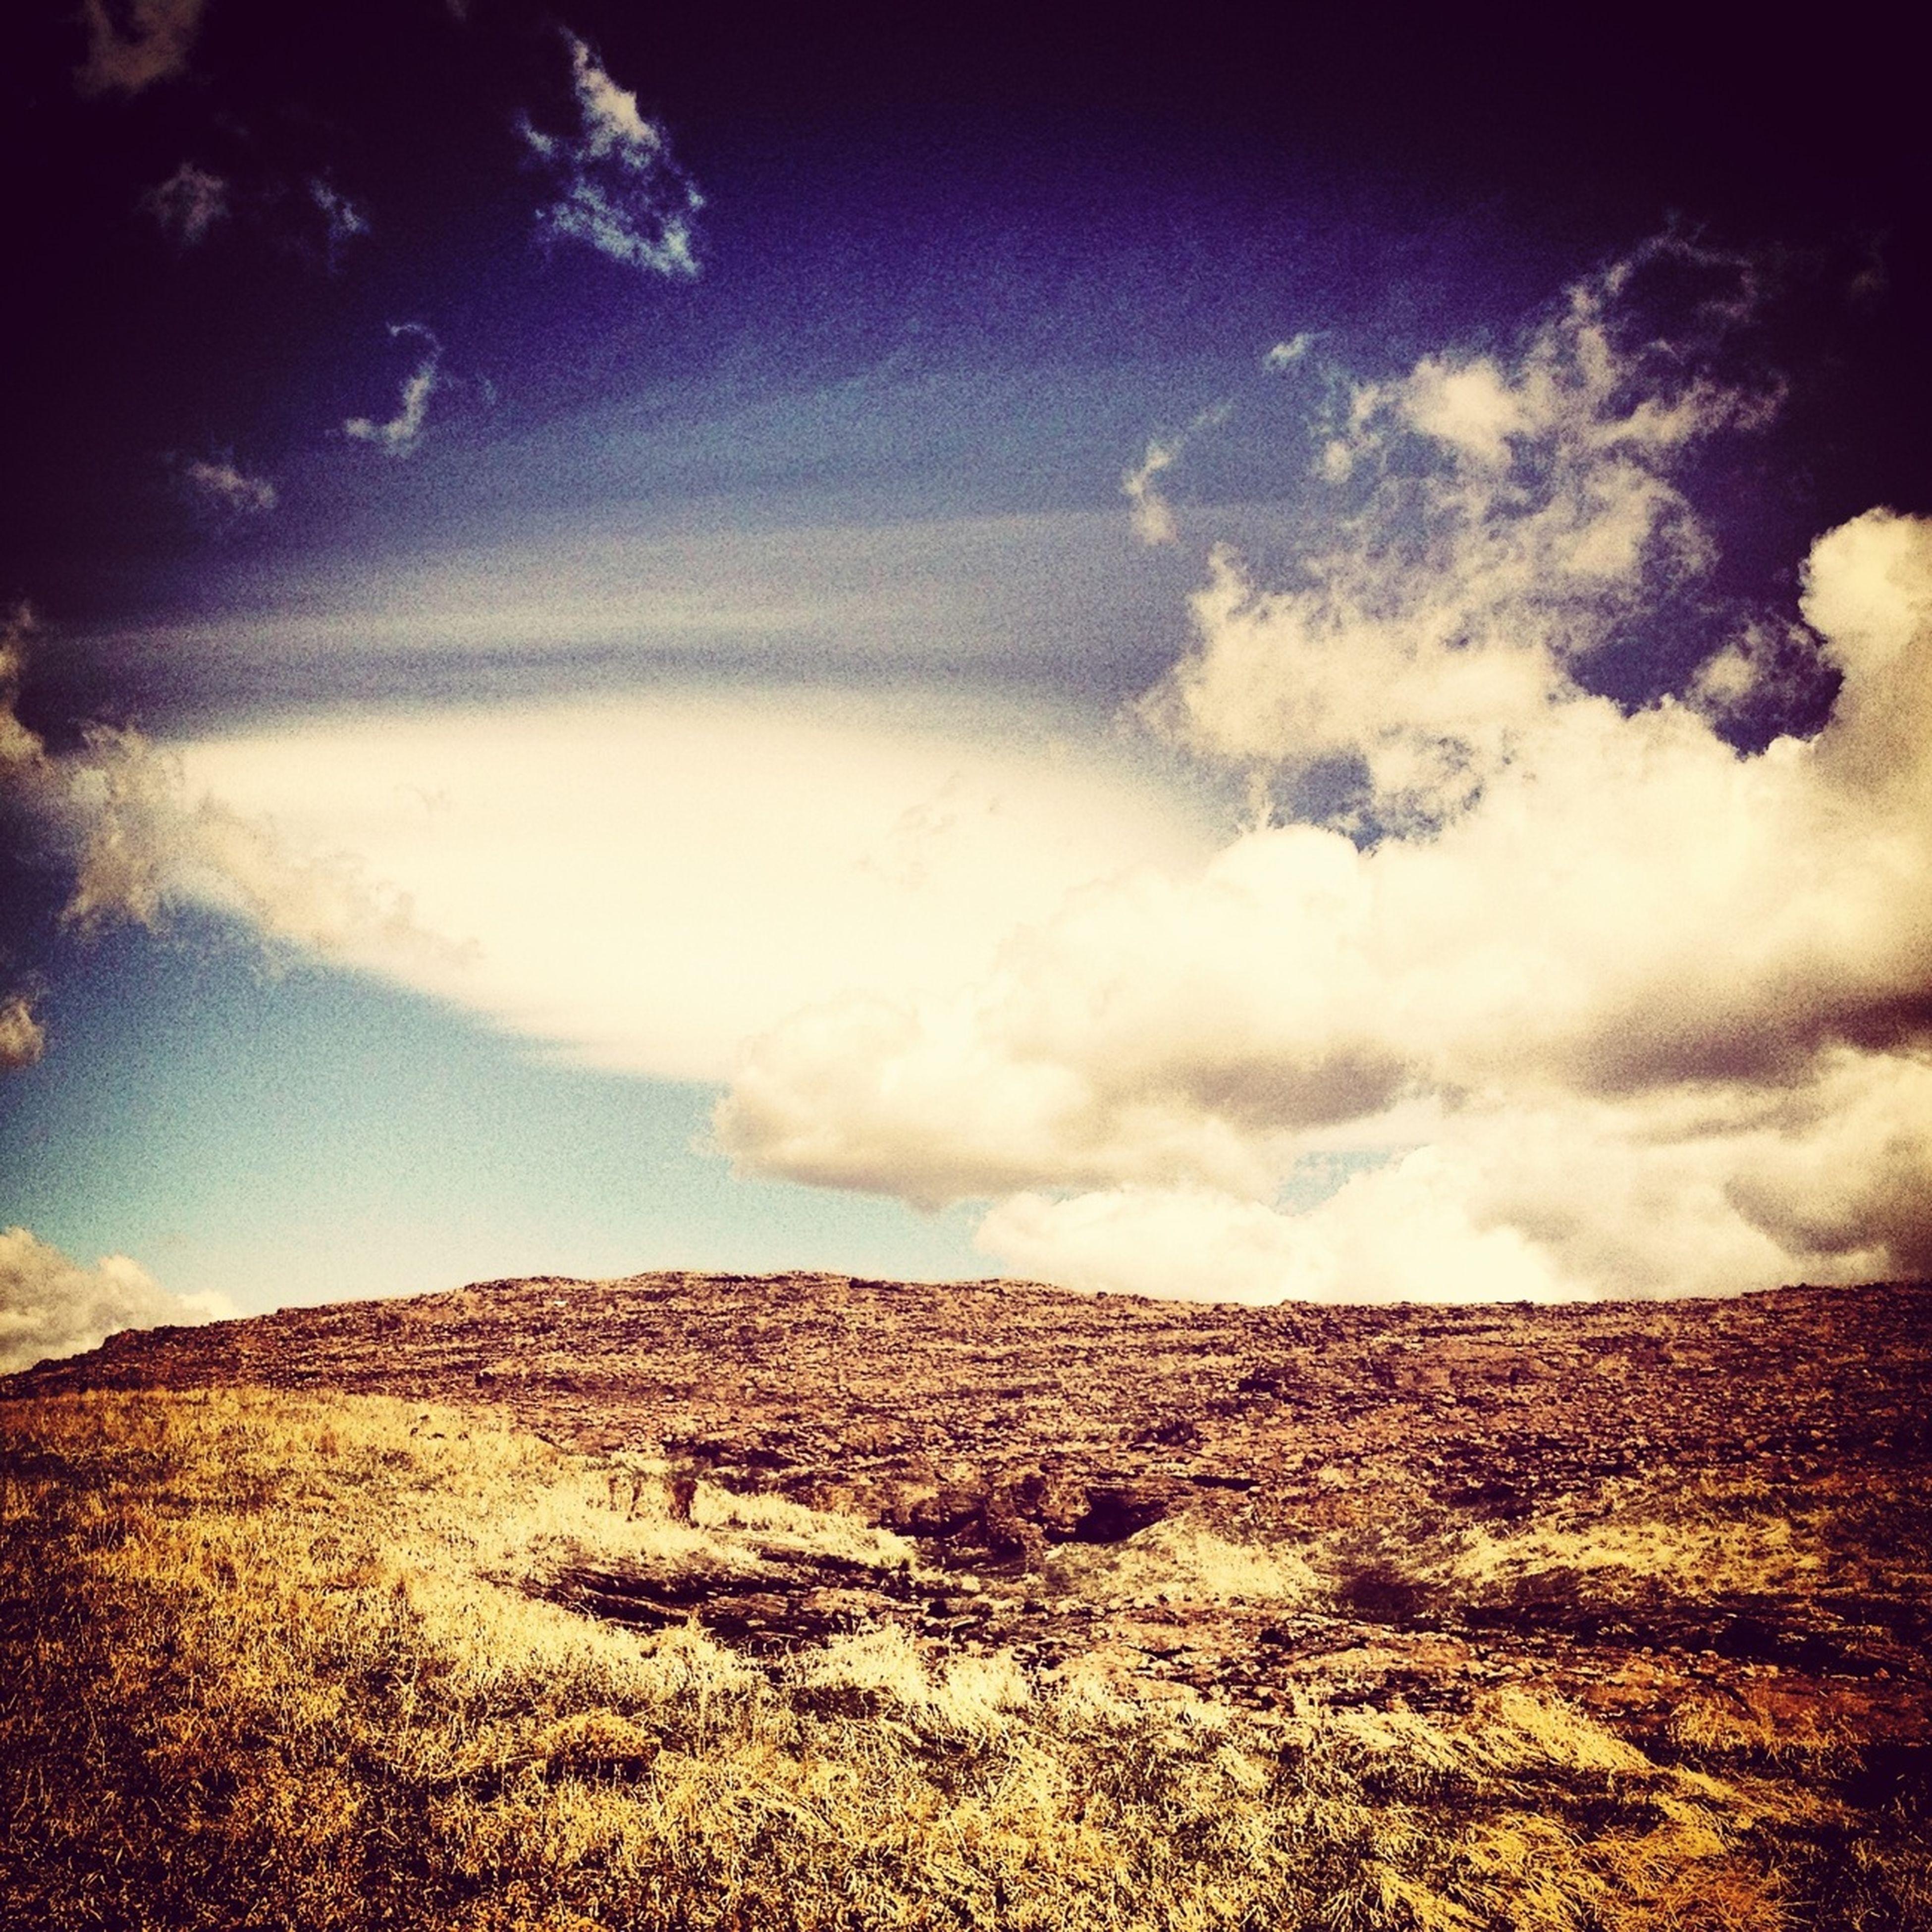 sky, cloud - sky, landscape, tranquil scene, tranquility, cloudy, scenics, beauty in nature, nature, field, cloud, weather, horizon over land, overcast, non-urban scene, idyllic, grass, cloudscape, remote, storm cloud